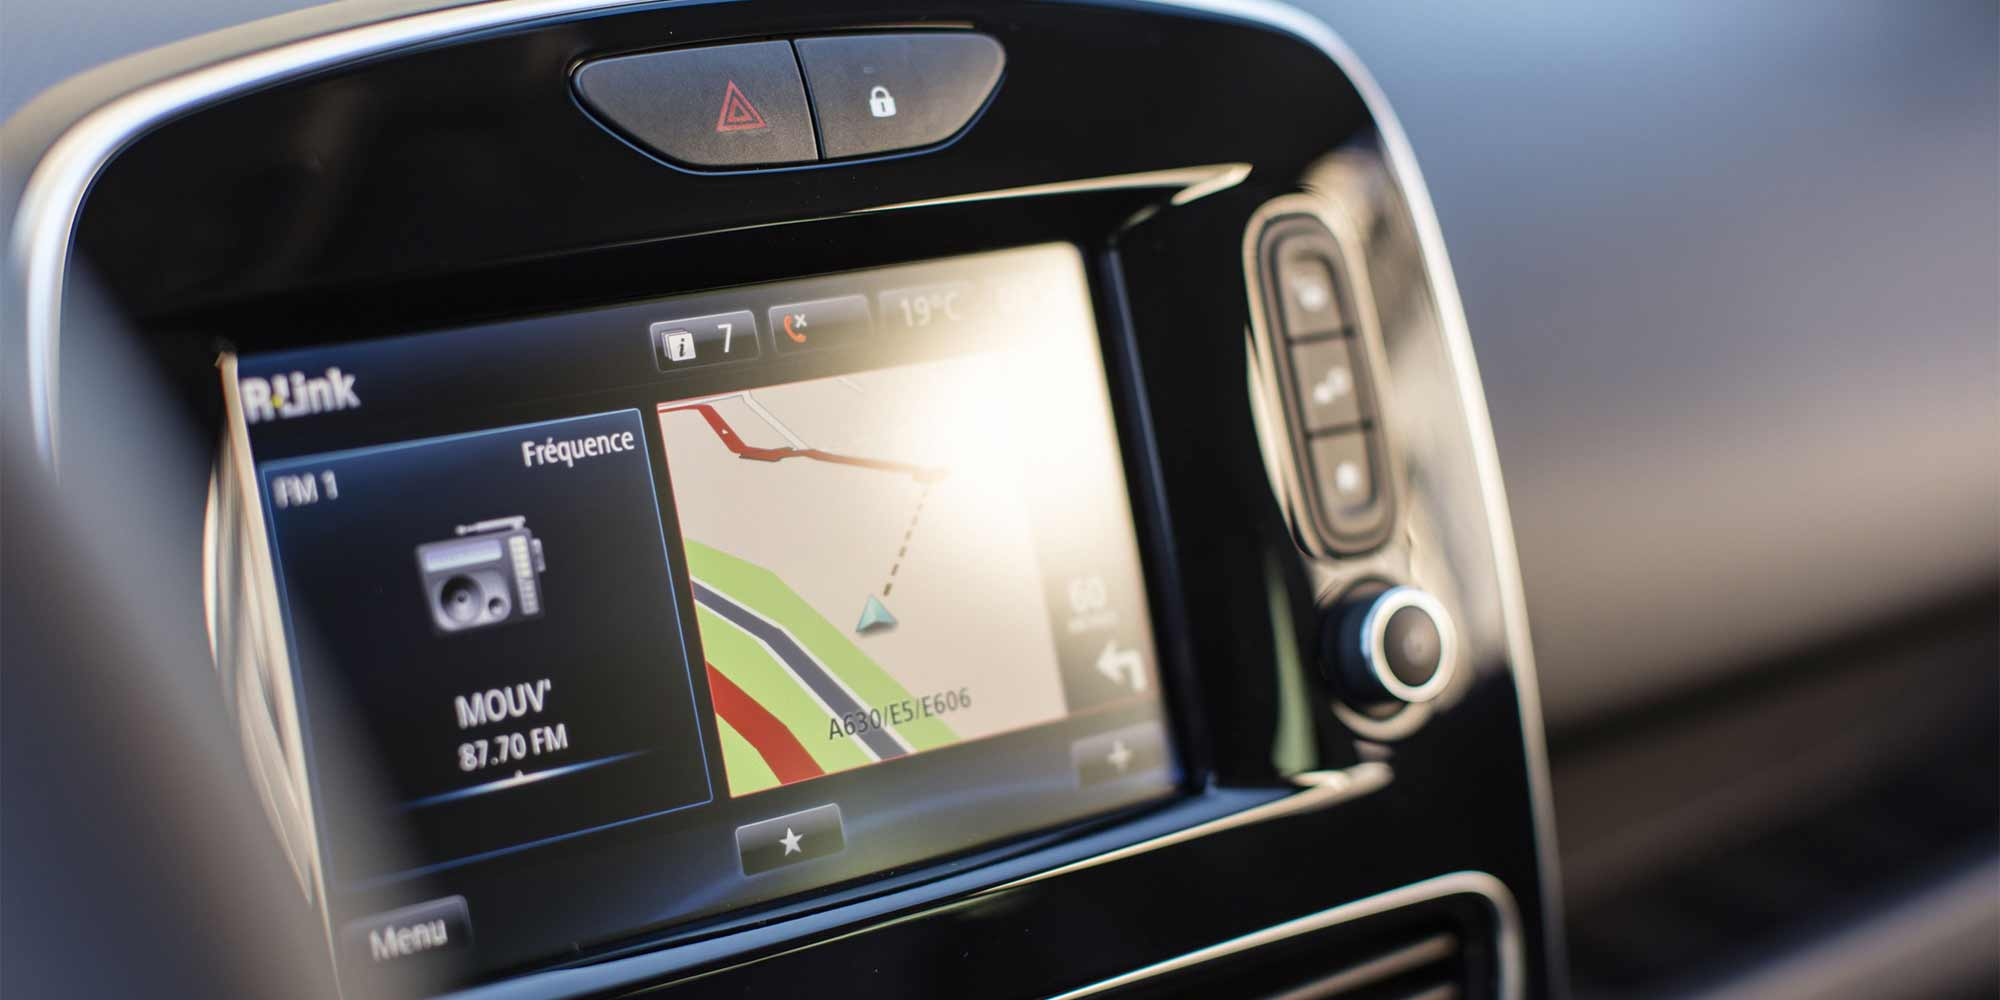 Clio, Navigationssystem, Renault, 2016